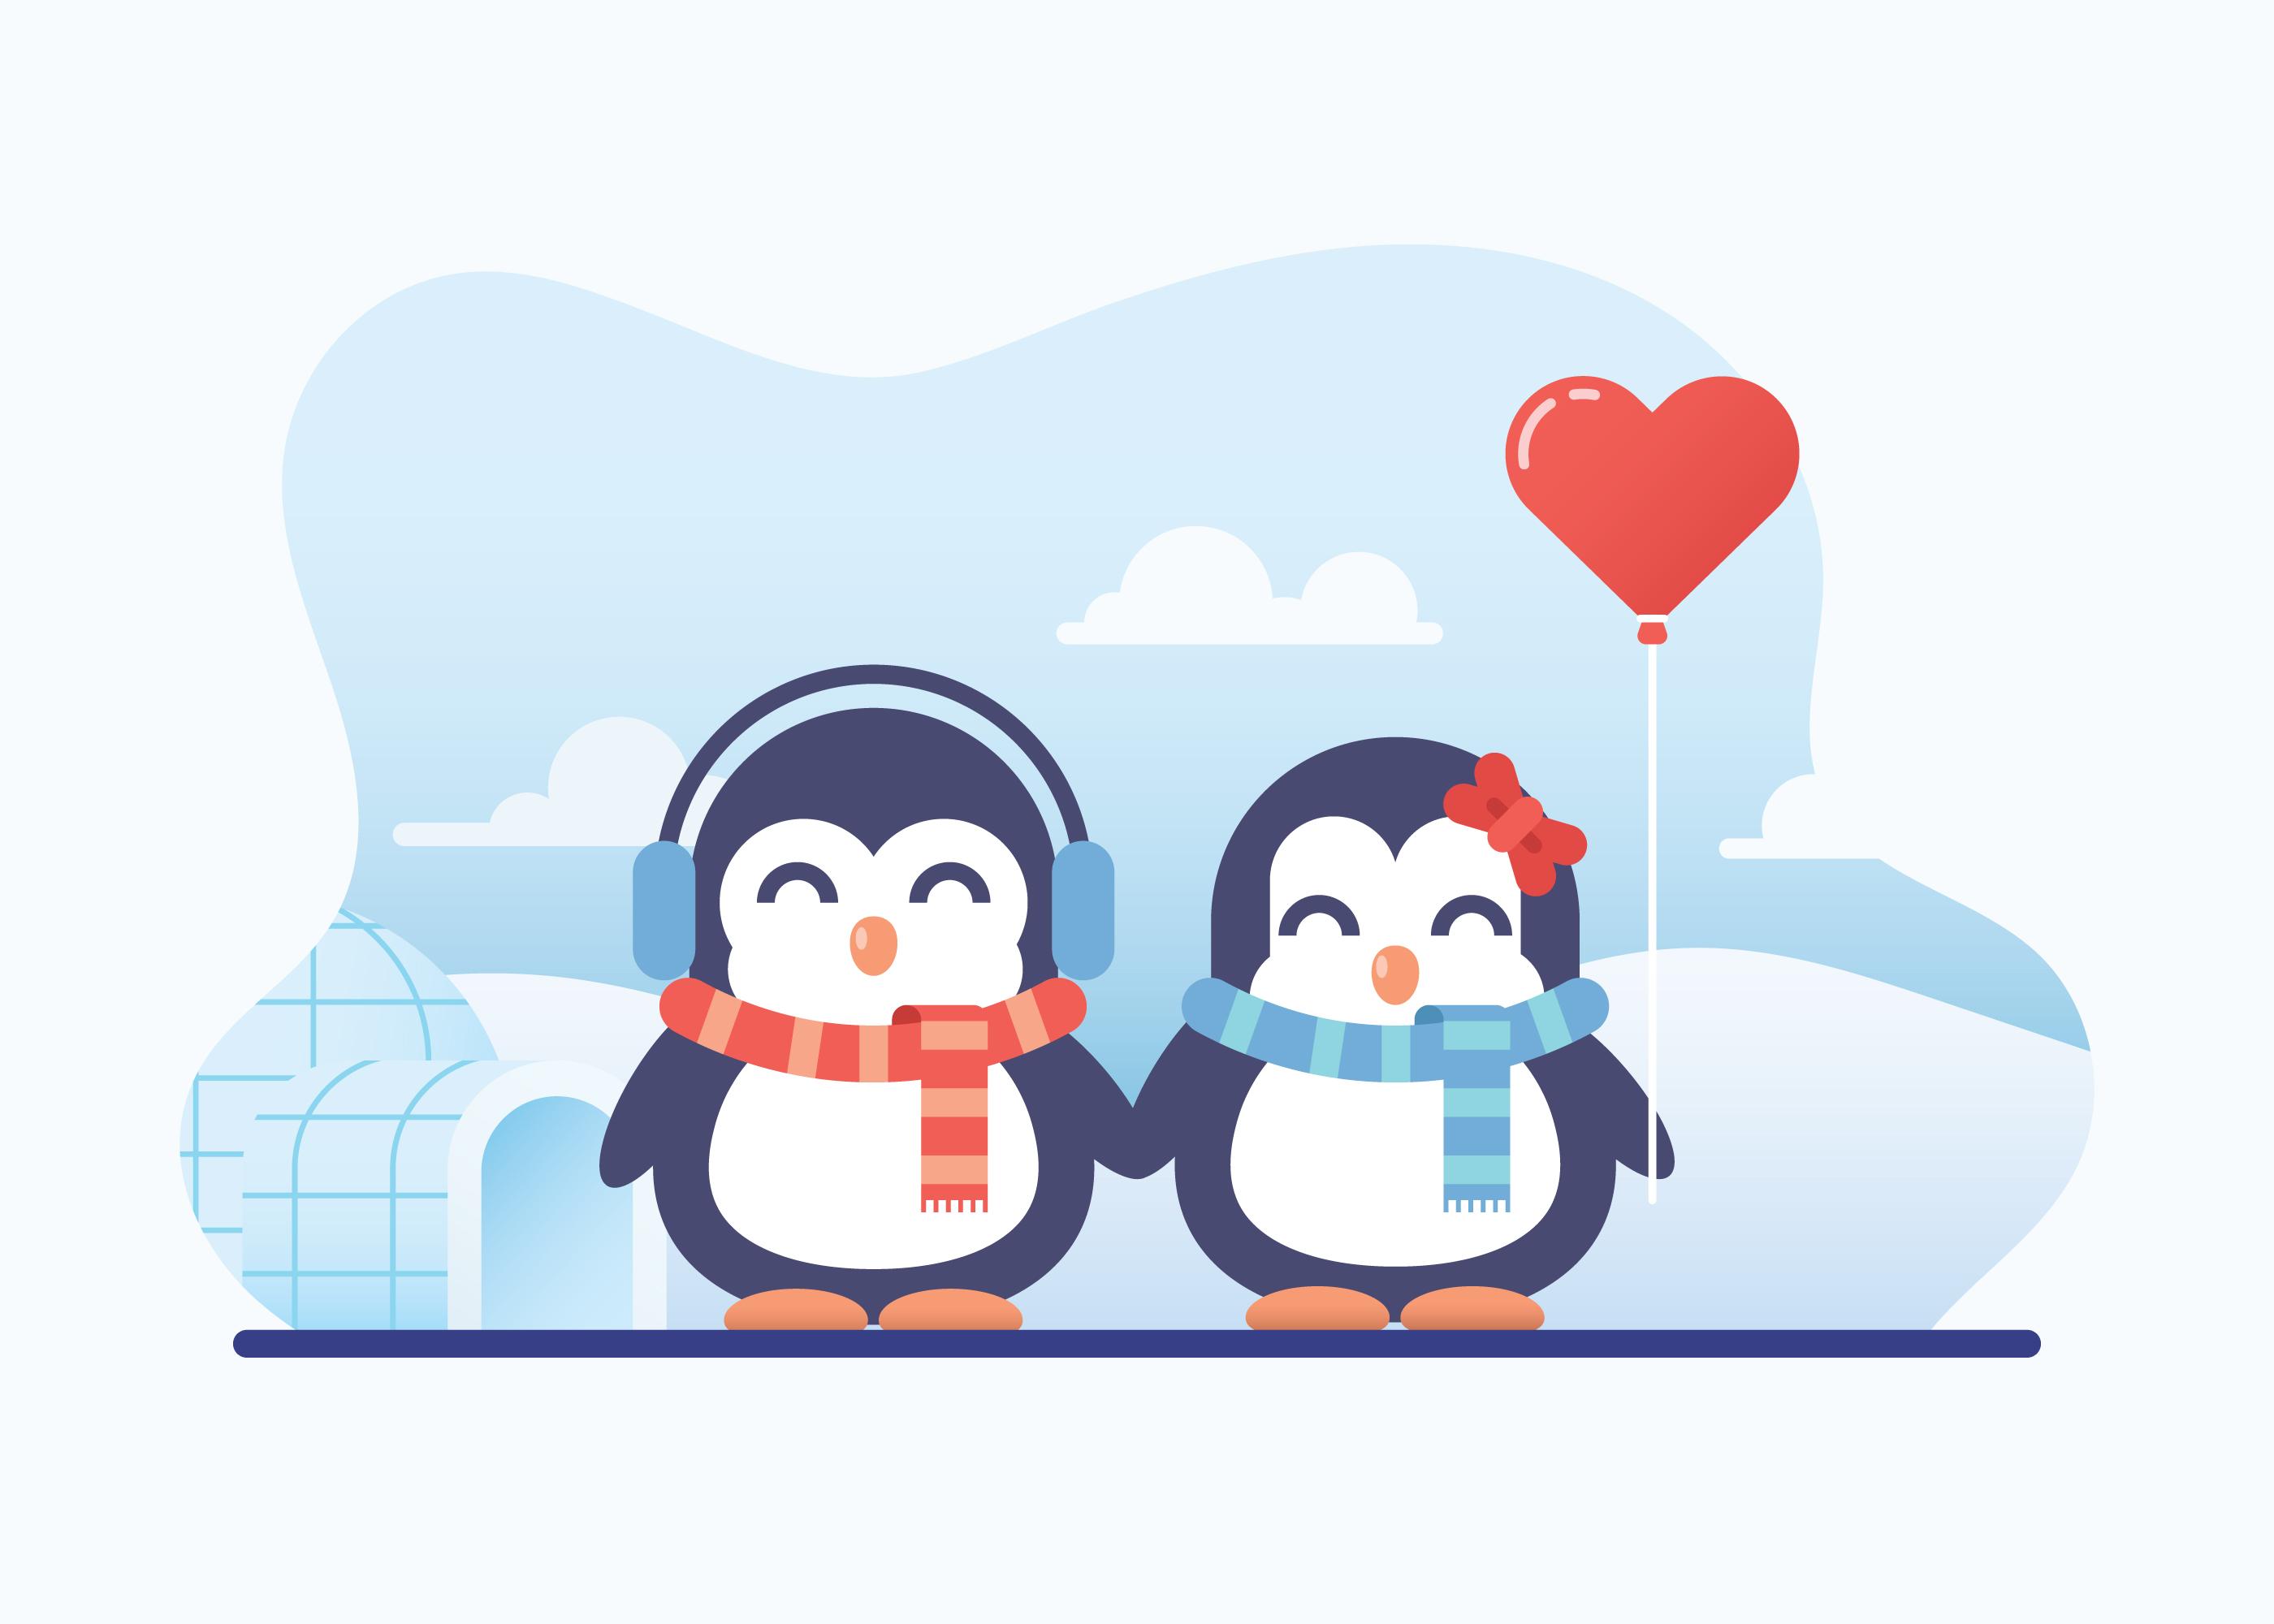 cute penguin love wallpaper ��������������������������������hasshe